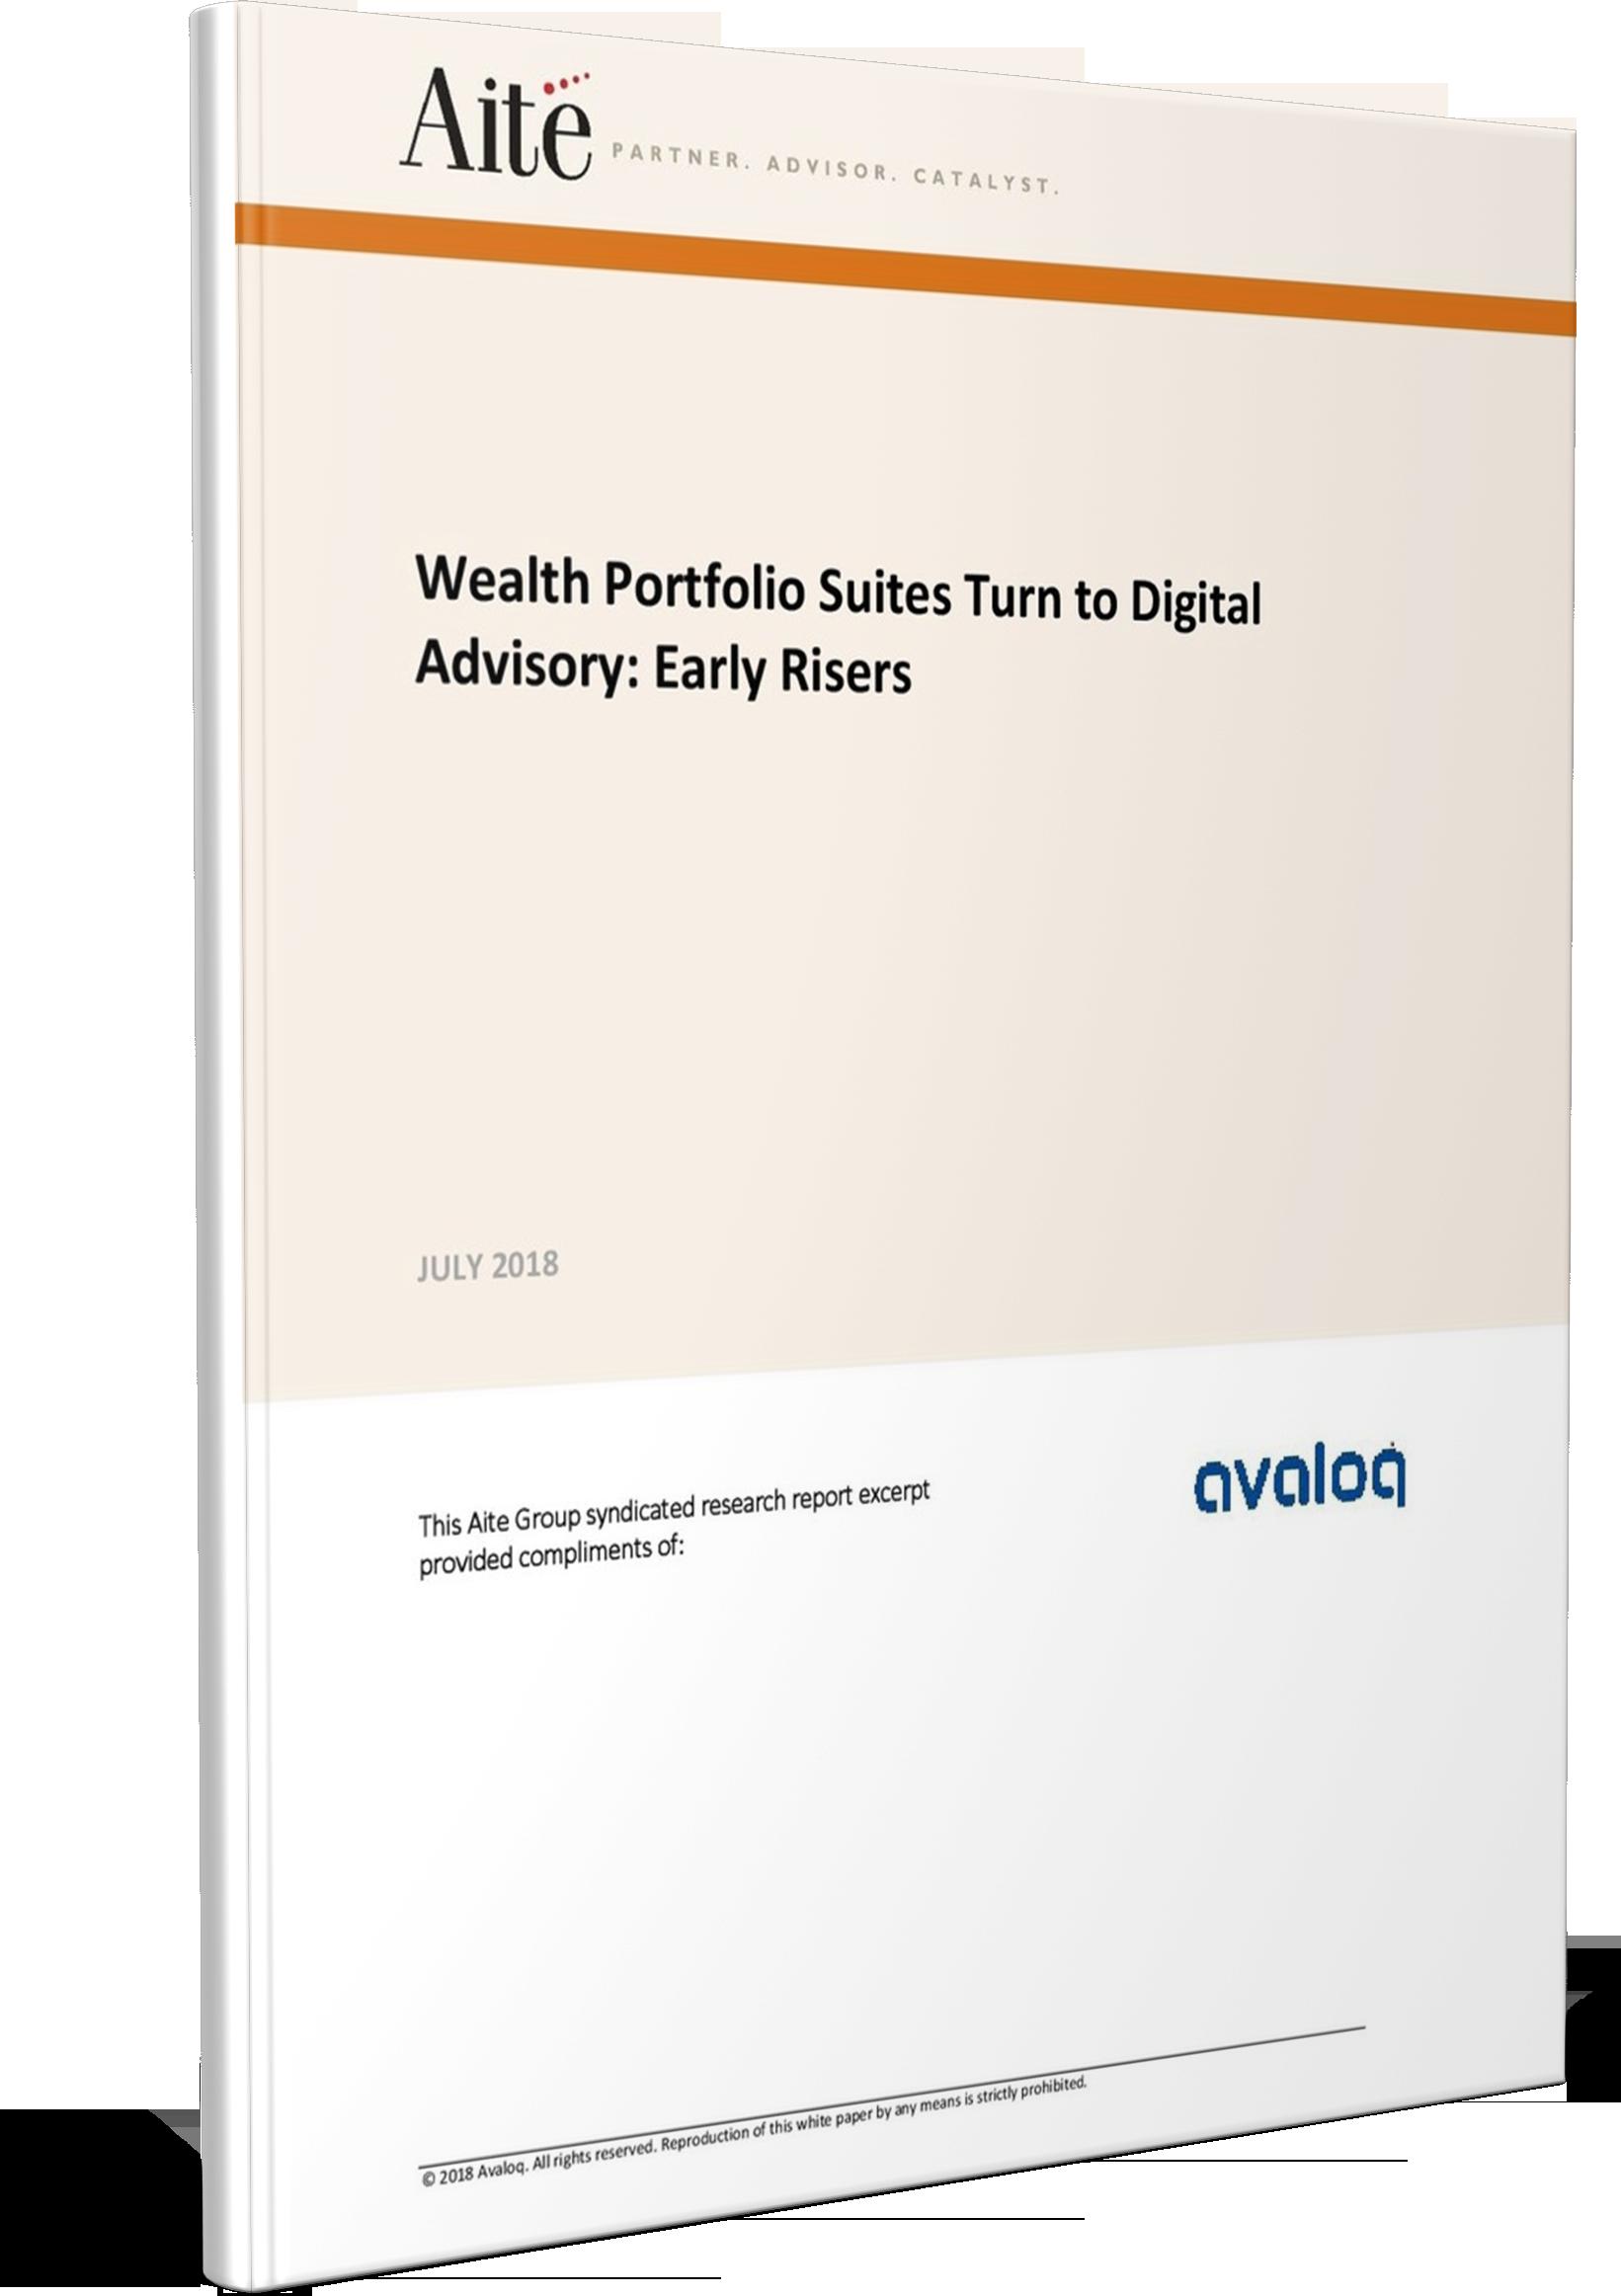 3D_Cover Aite WP Wealth portfolio suites turn to digital advisory_APAC